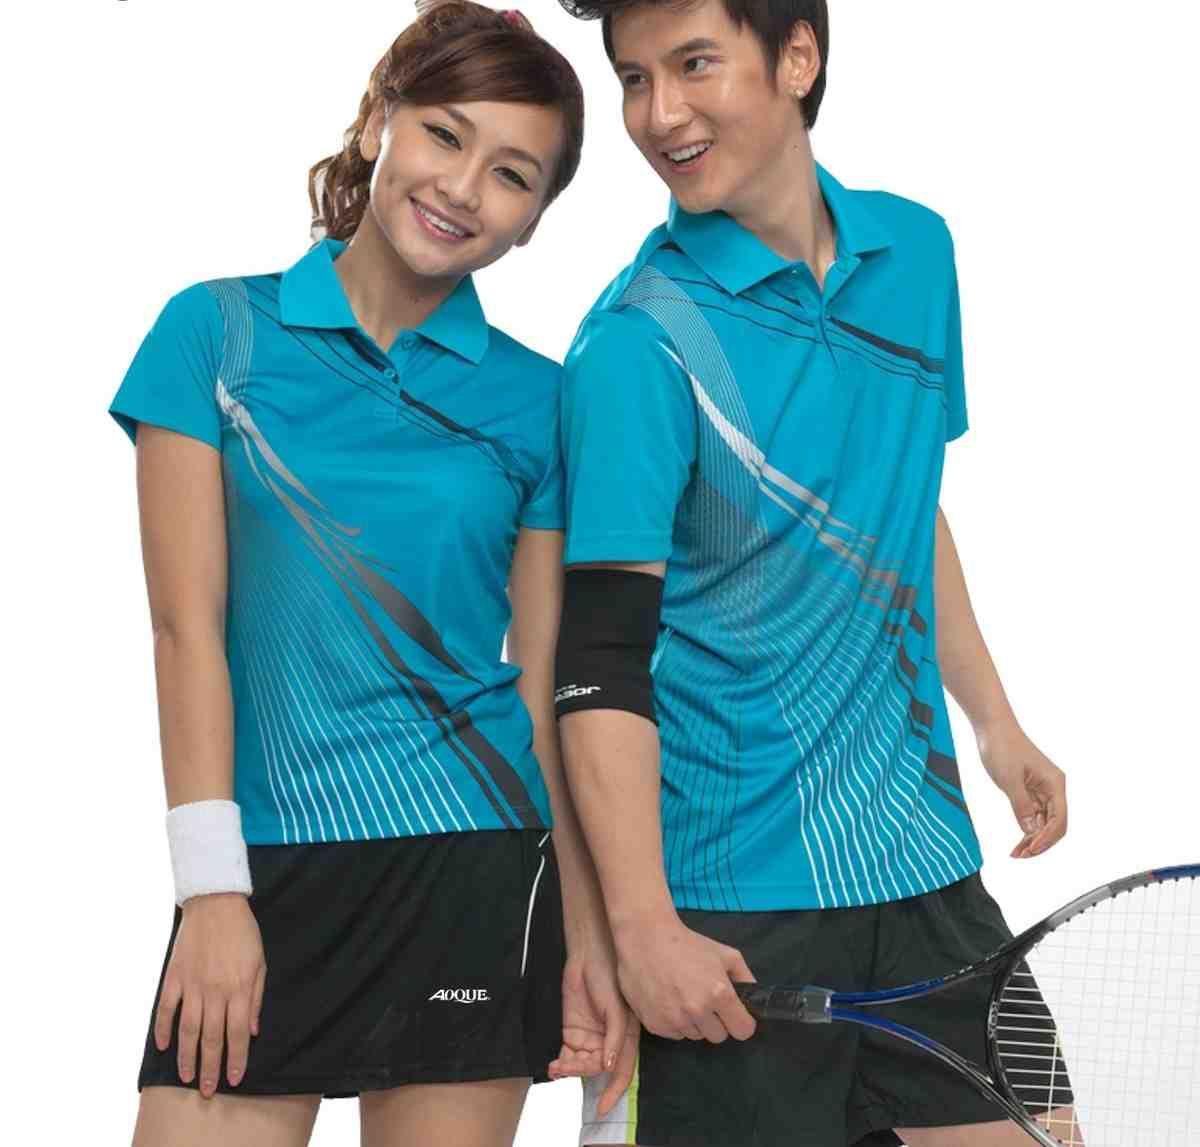 Tennis Clothing Brands List Tenis Remera